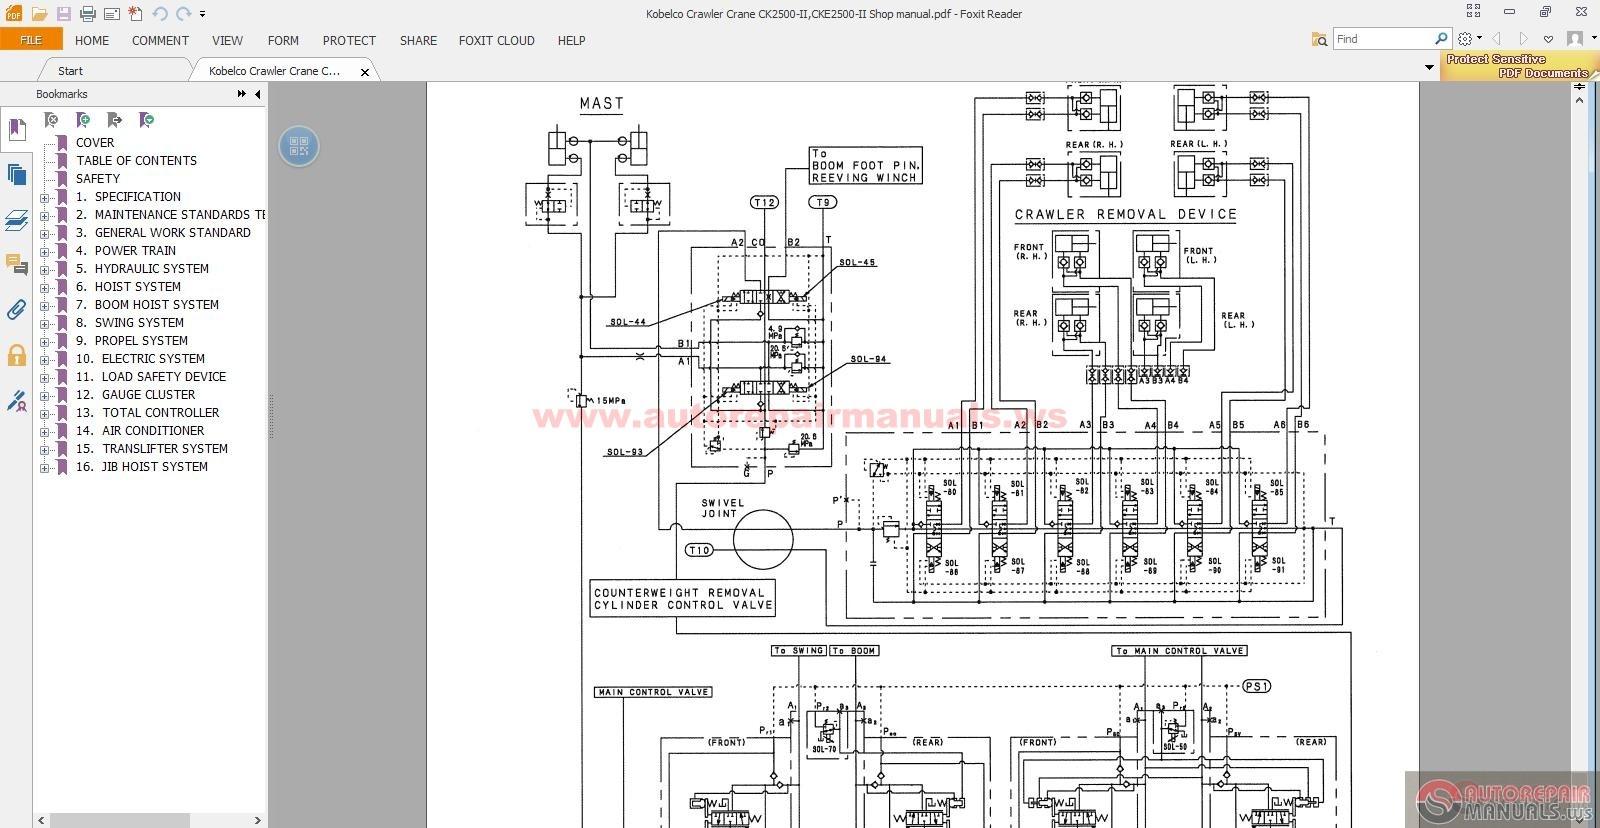 Kobelco_Crawler_Crane_CK2500 IICKE2500 II_Shop_manual5 kobelco crawler crane ck2500 ii,cke2500 ii shop manual auto kobelco sk200 wiring diagram at readyjetset.co